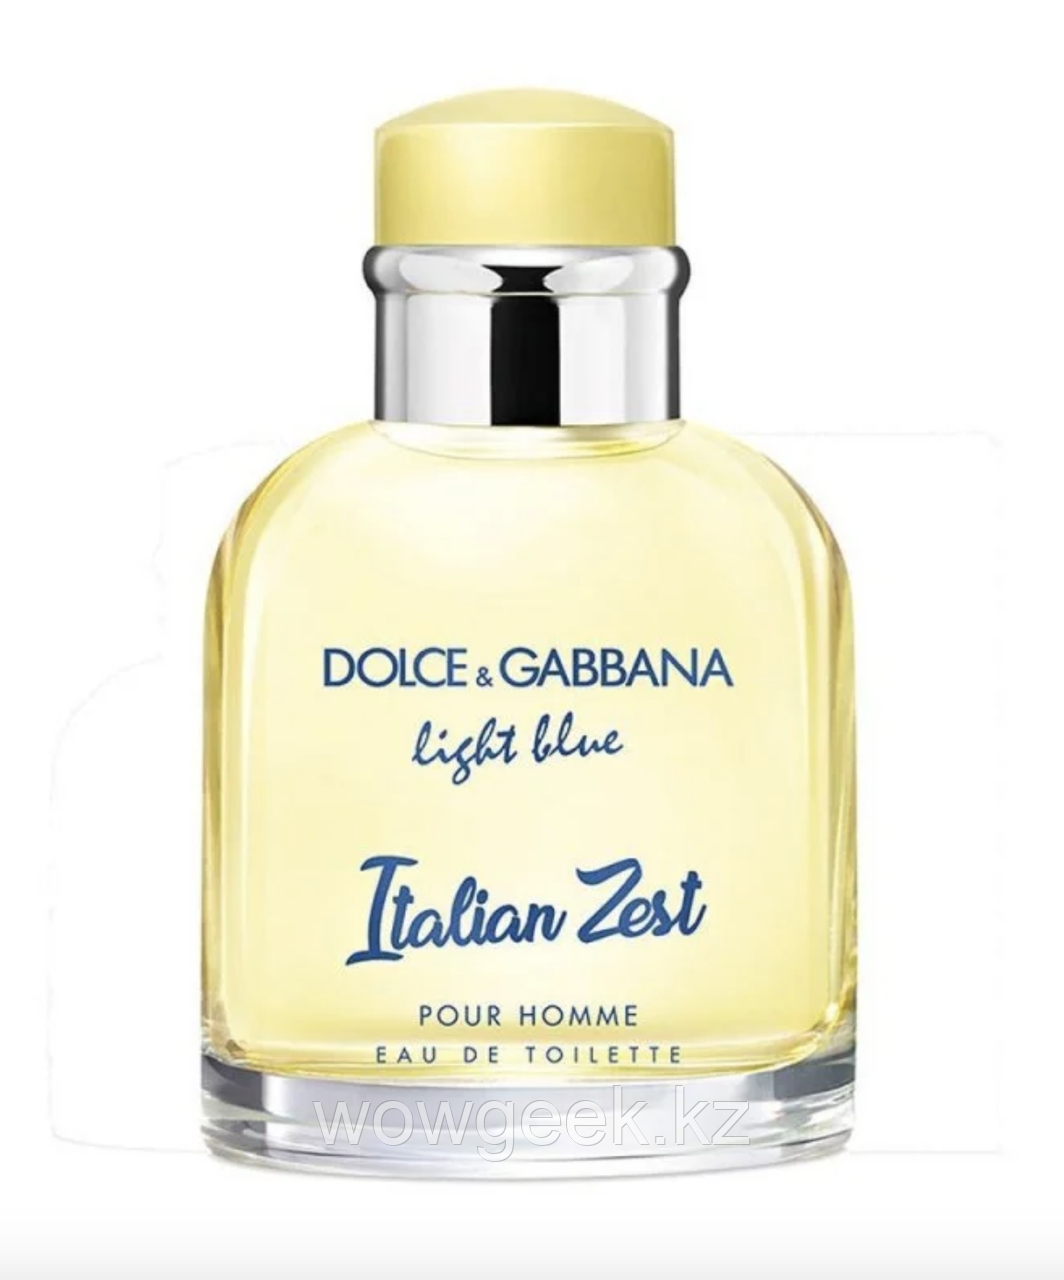 Мужская туалетная вода Dolce & Gabbana Light Blue Italian Zest pour homme